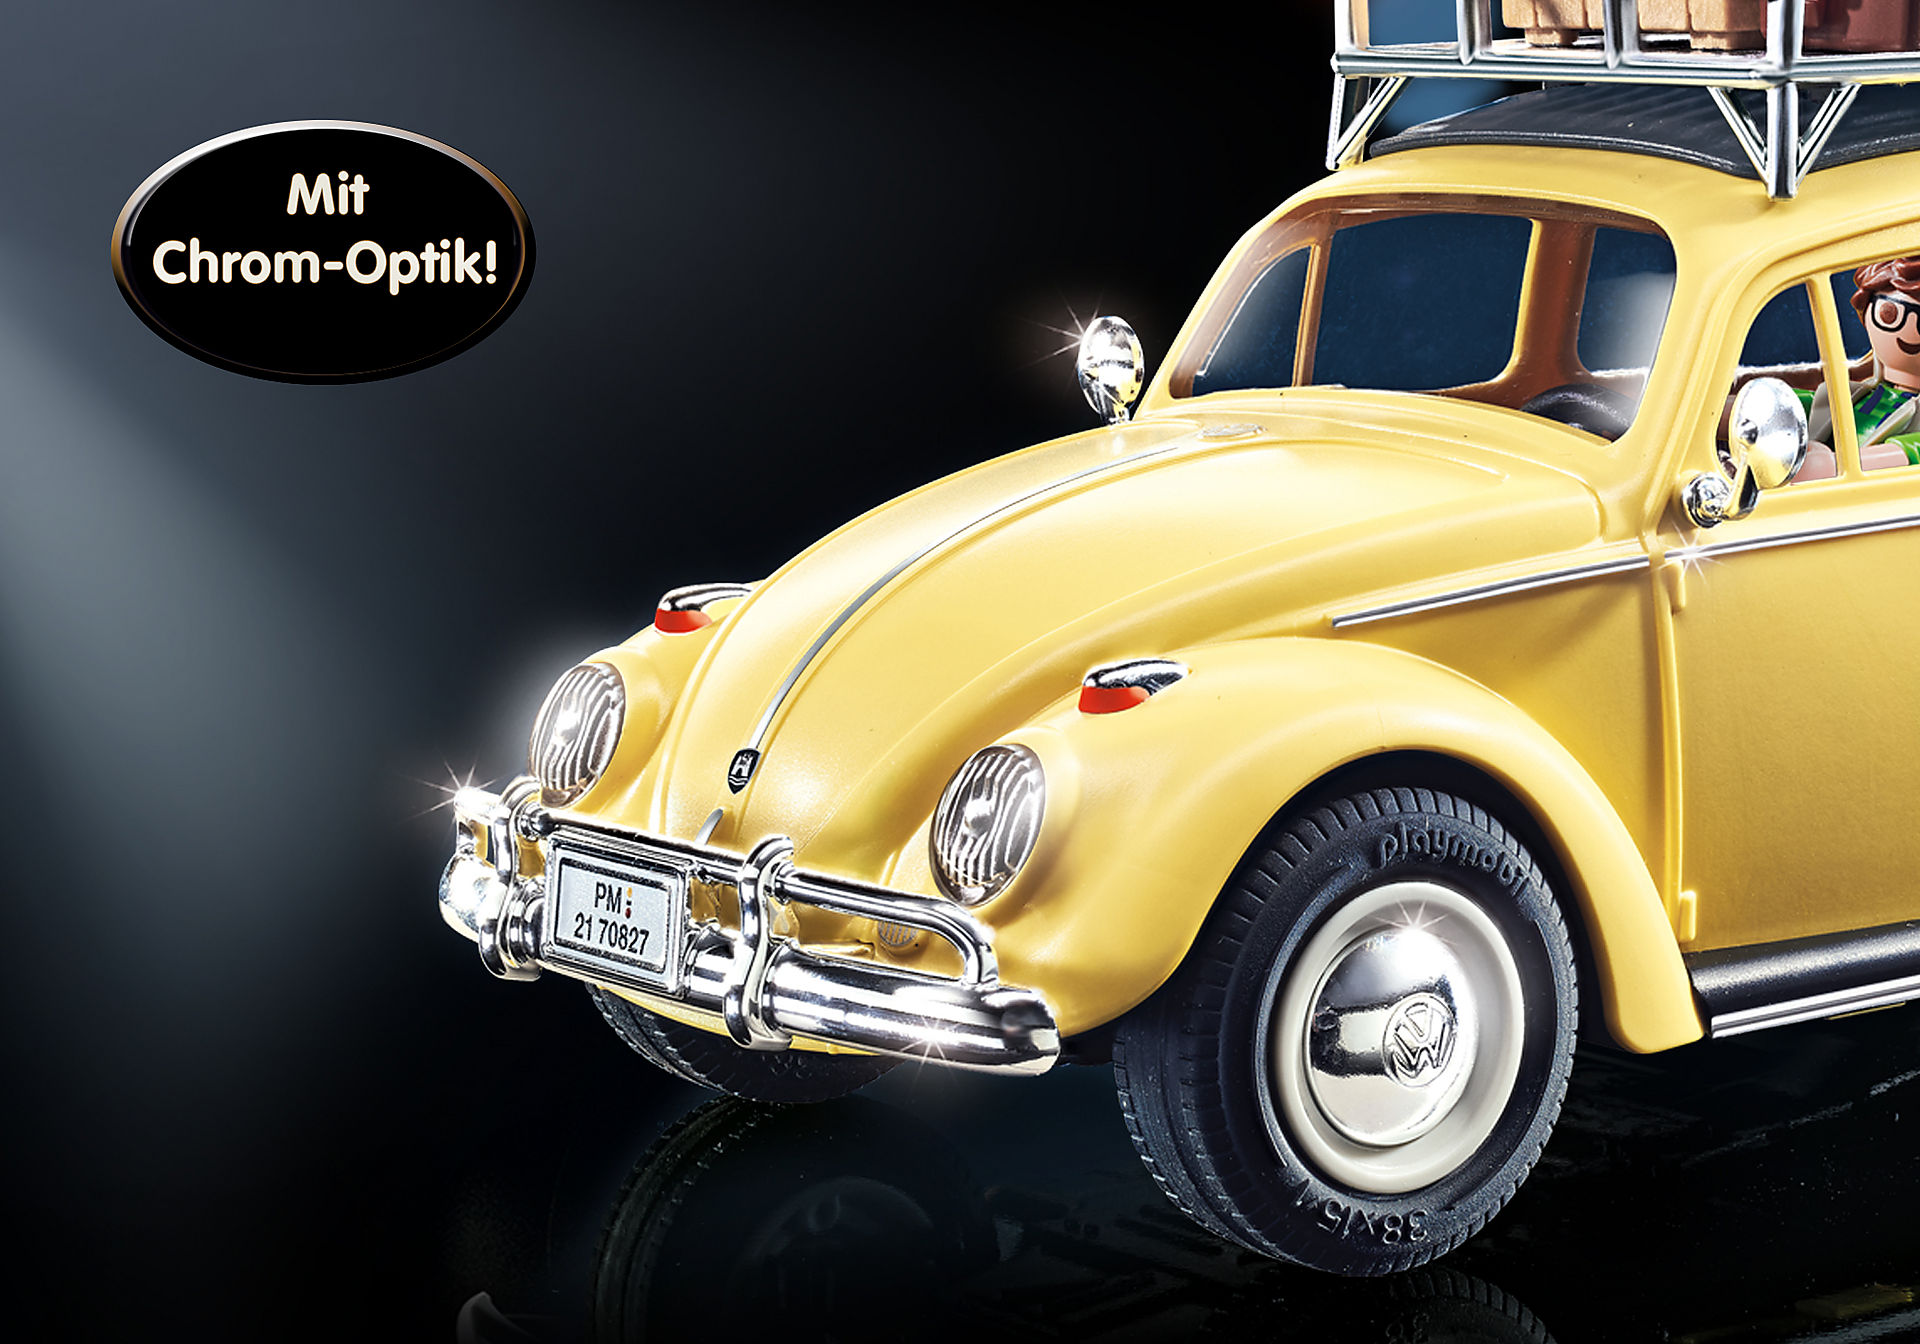 70827 Volkswagen Coccinelle - Edition spéciale zoom image4